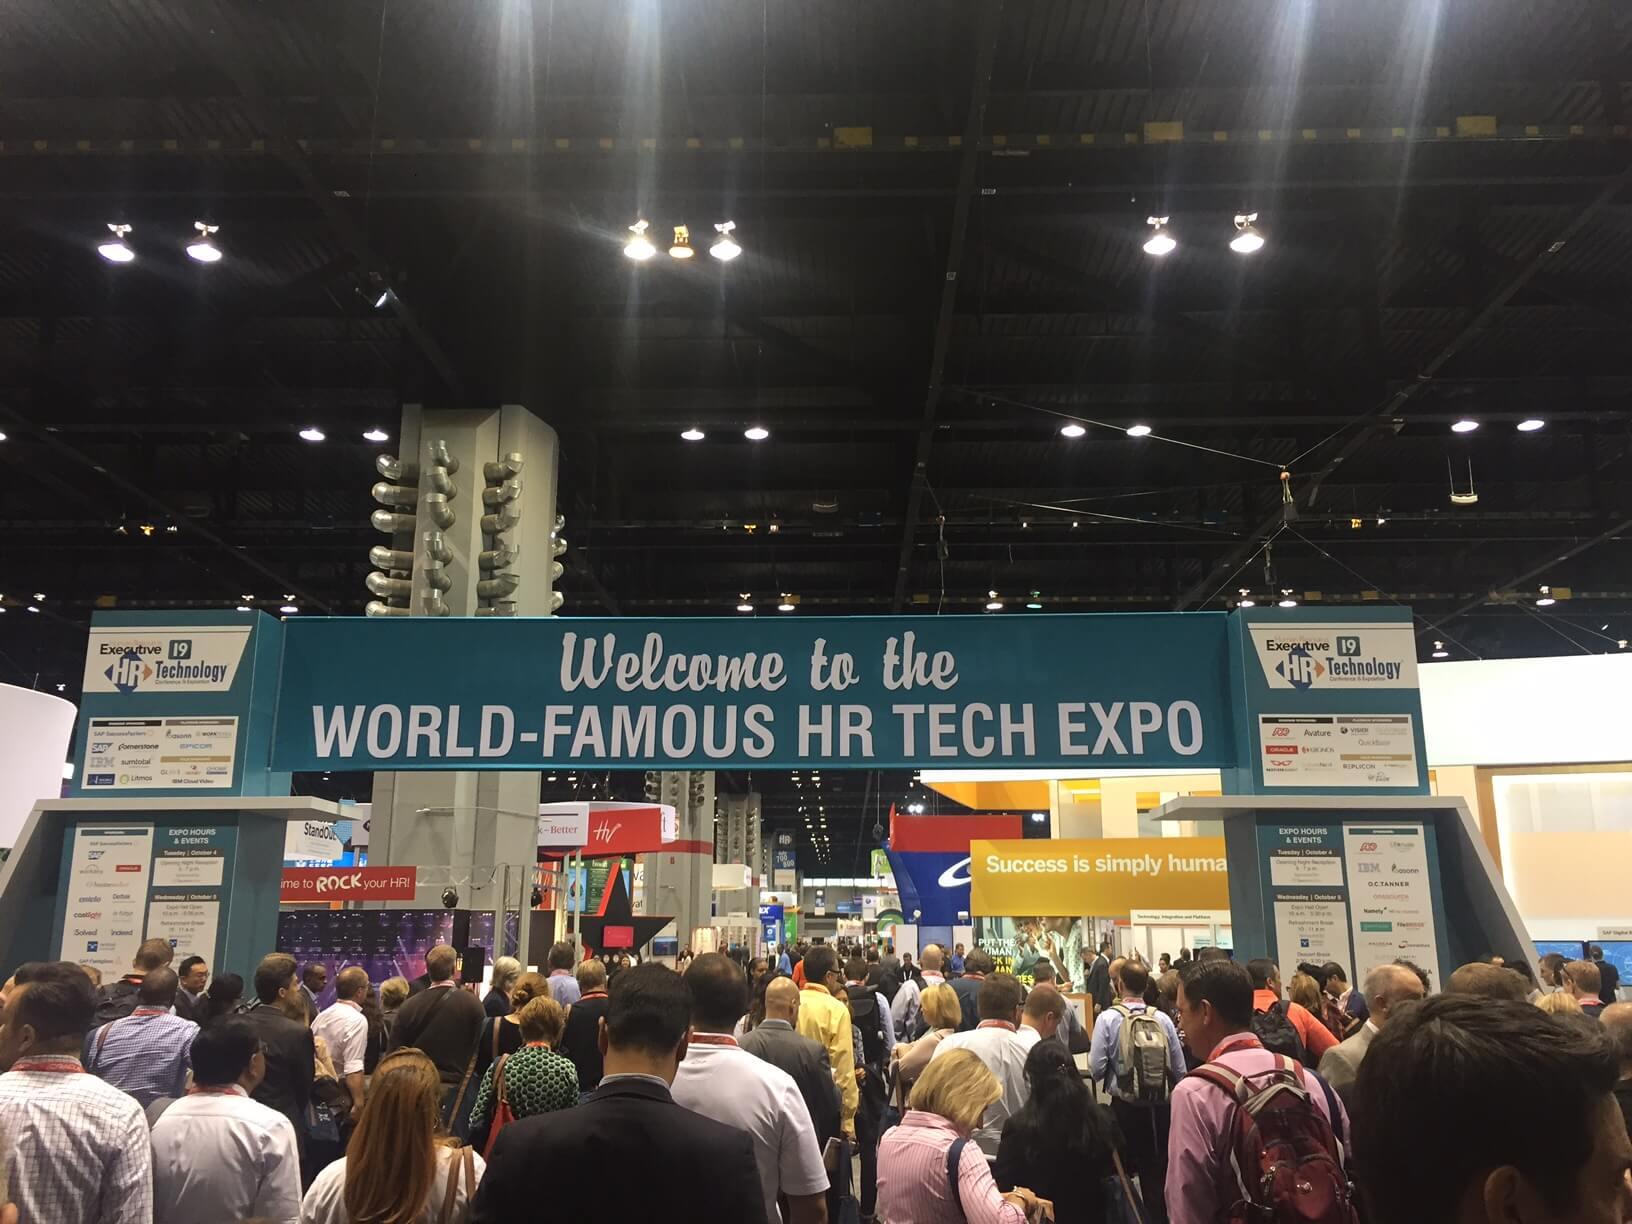 HRがマーケティングに近づく時代へ HR Technology Conference@シカゴで感じたこと